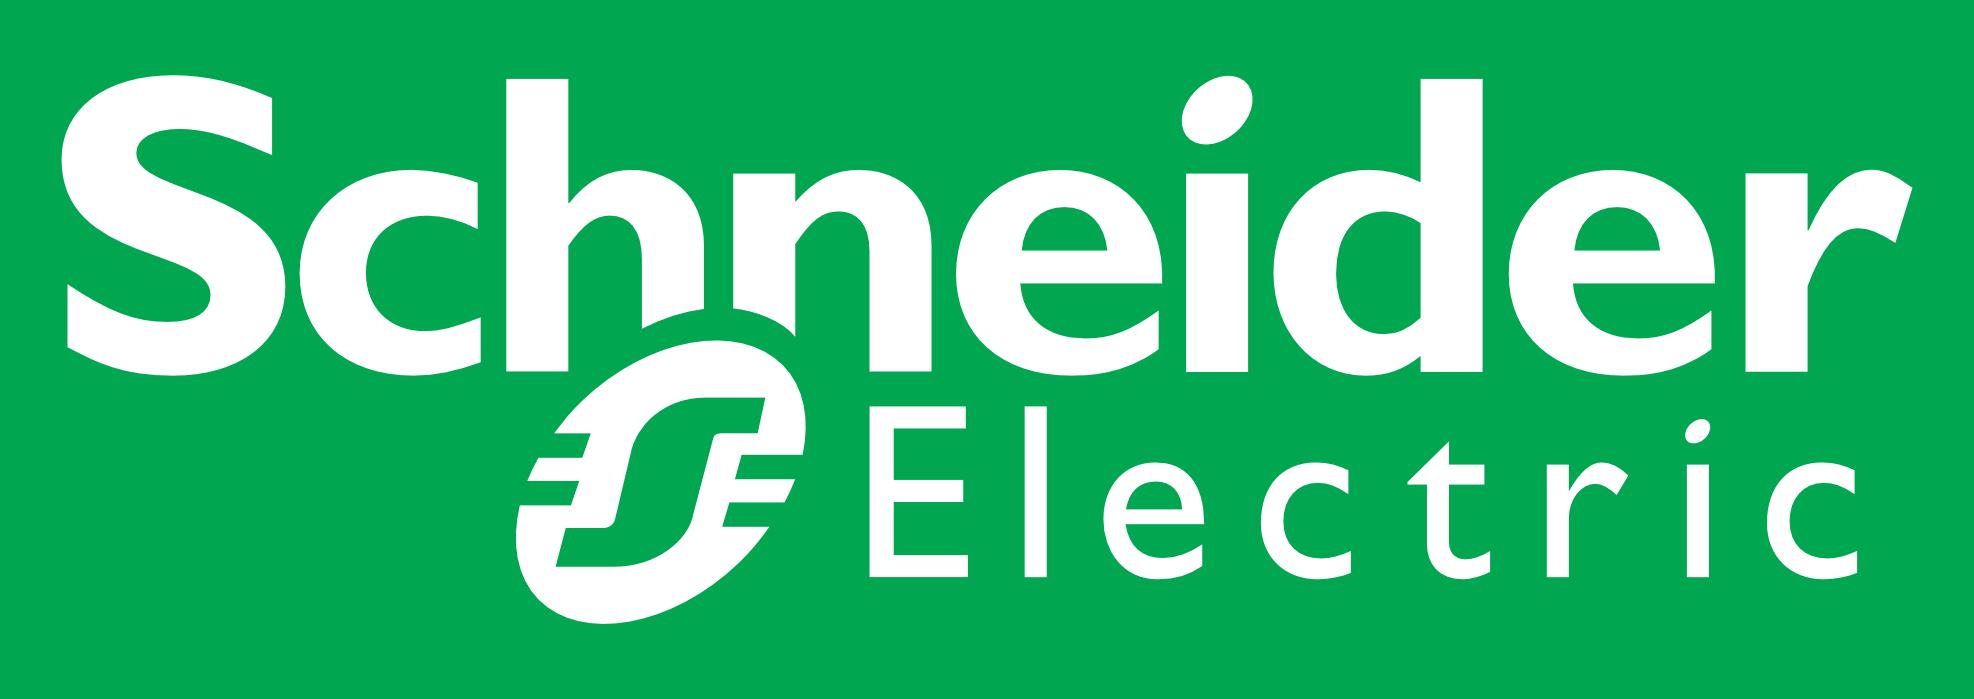 Schneider Electric Logo Green BG.png